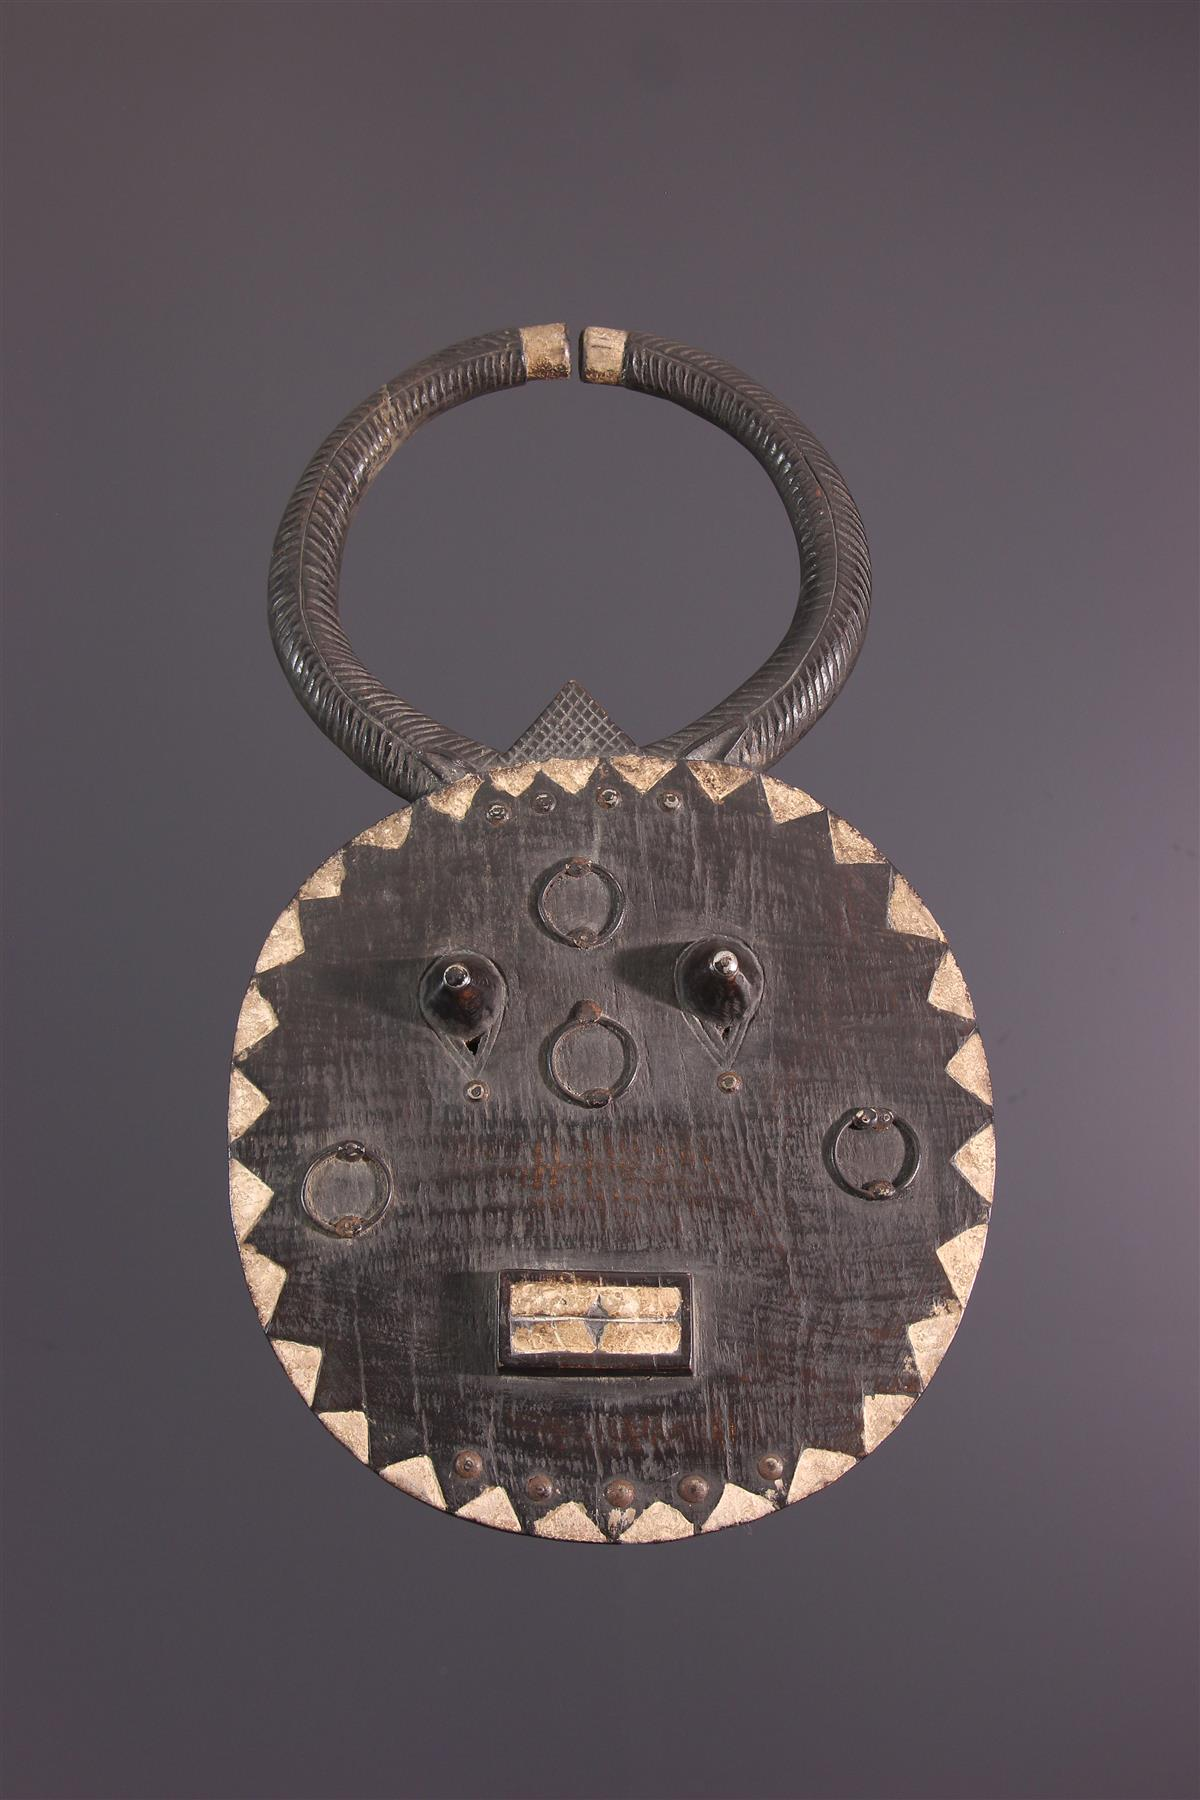 Kplé Kplé Mask - African art